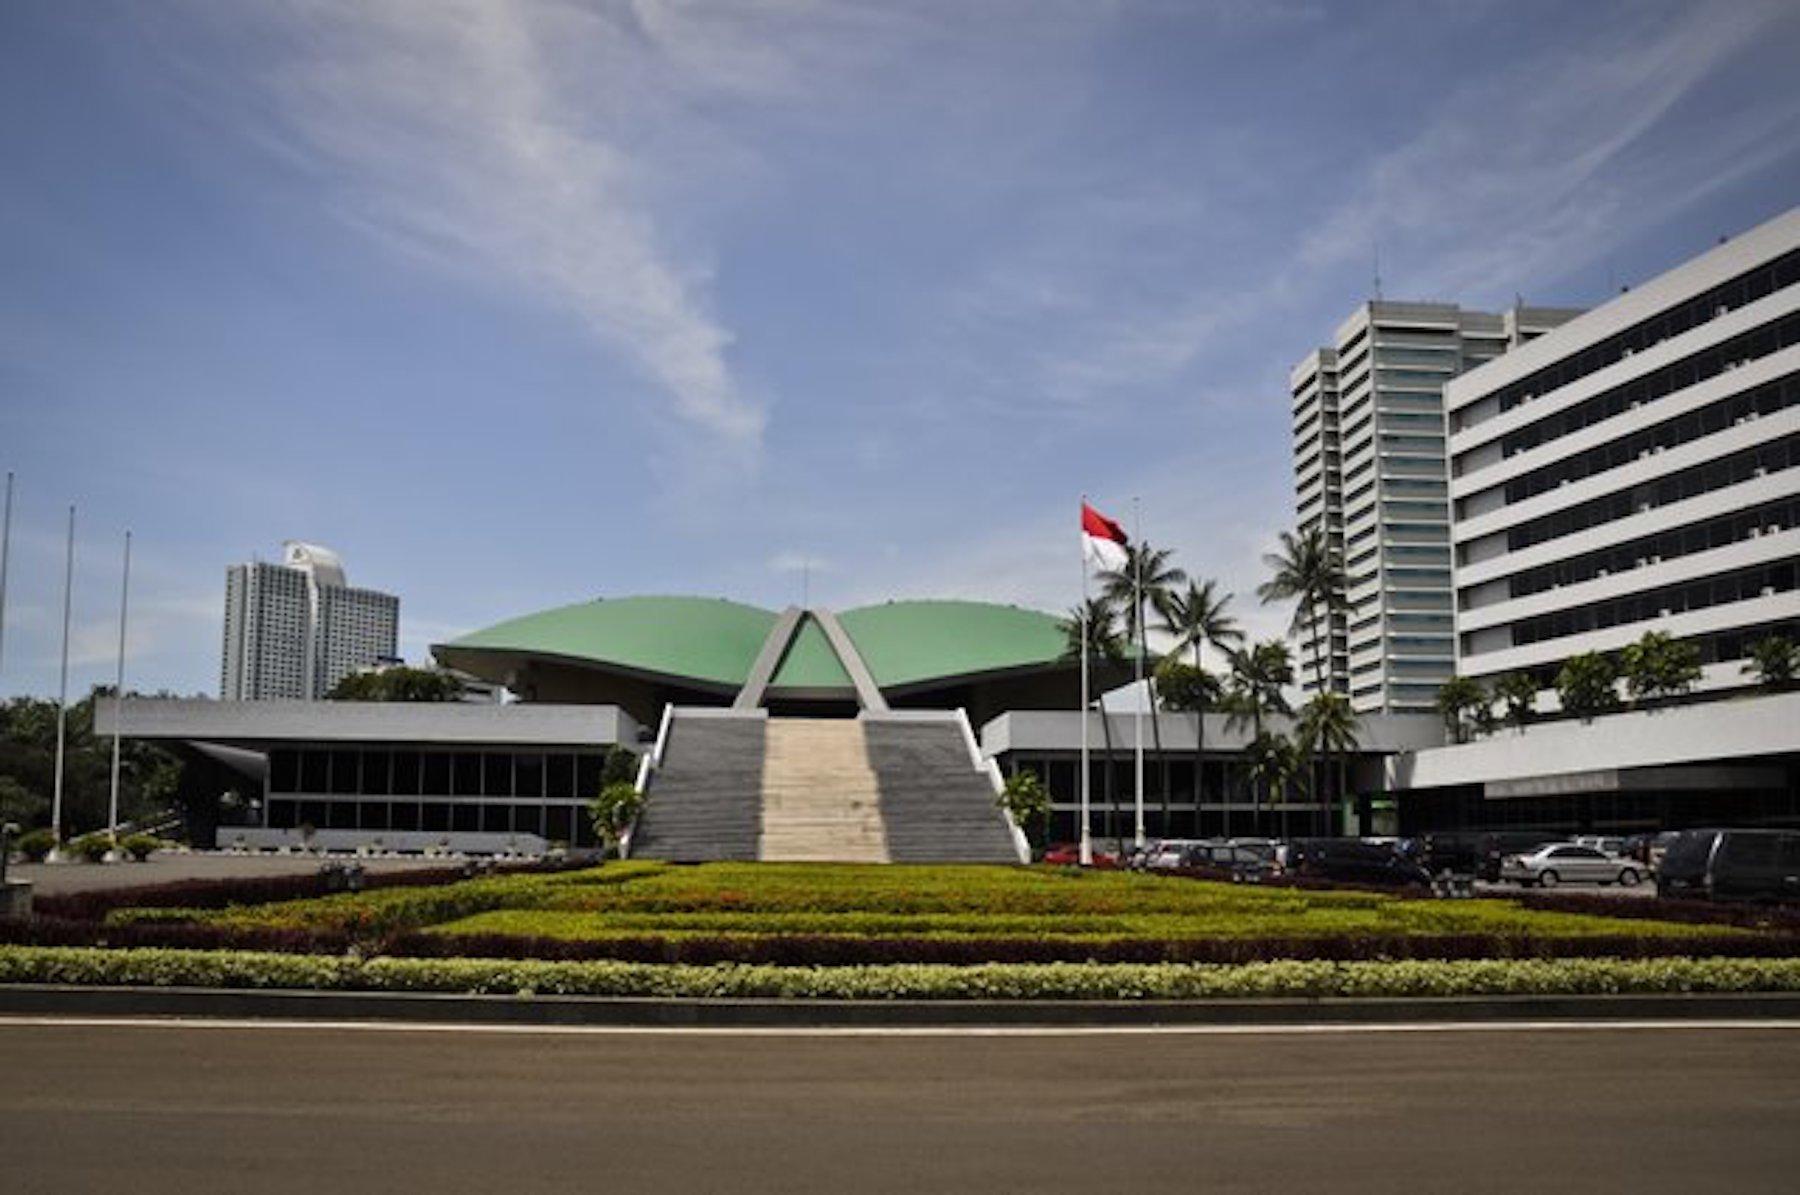 DPR-MPR building complex